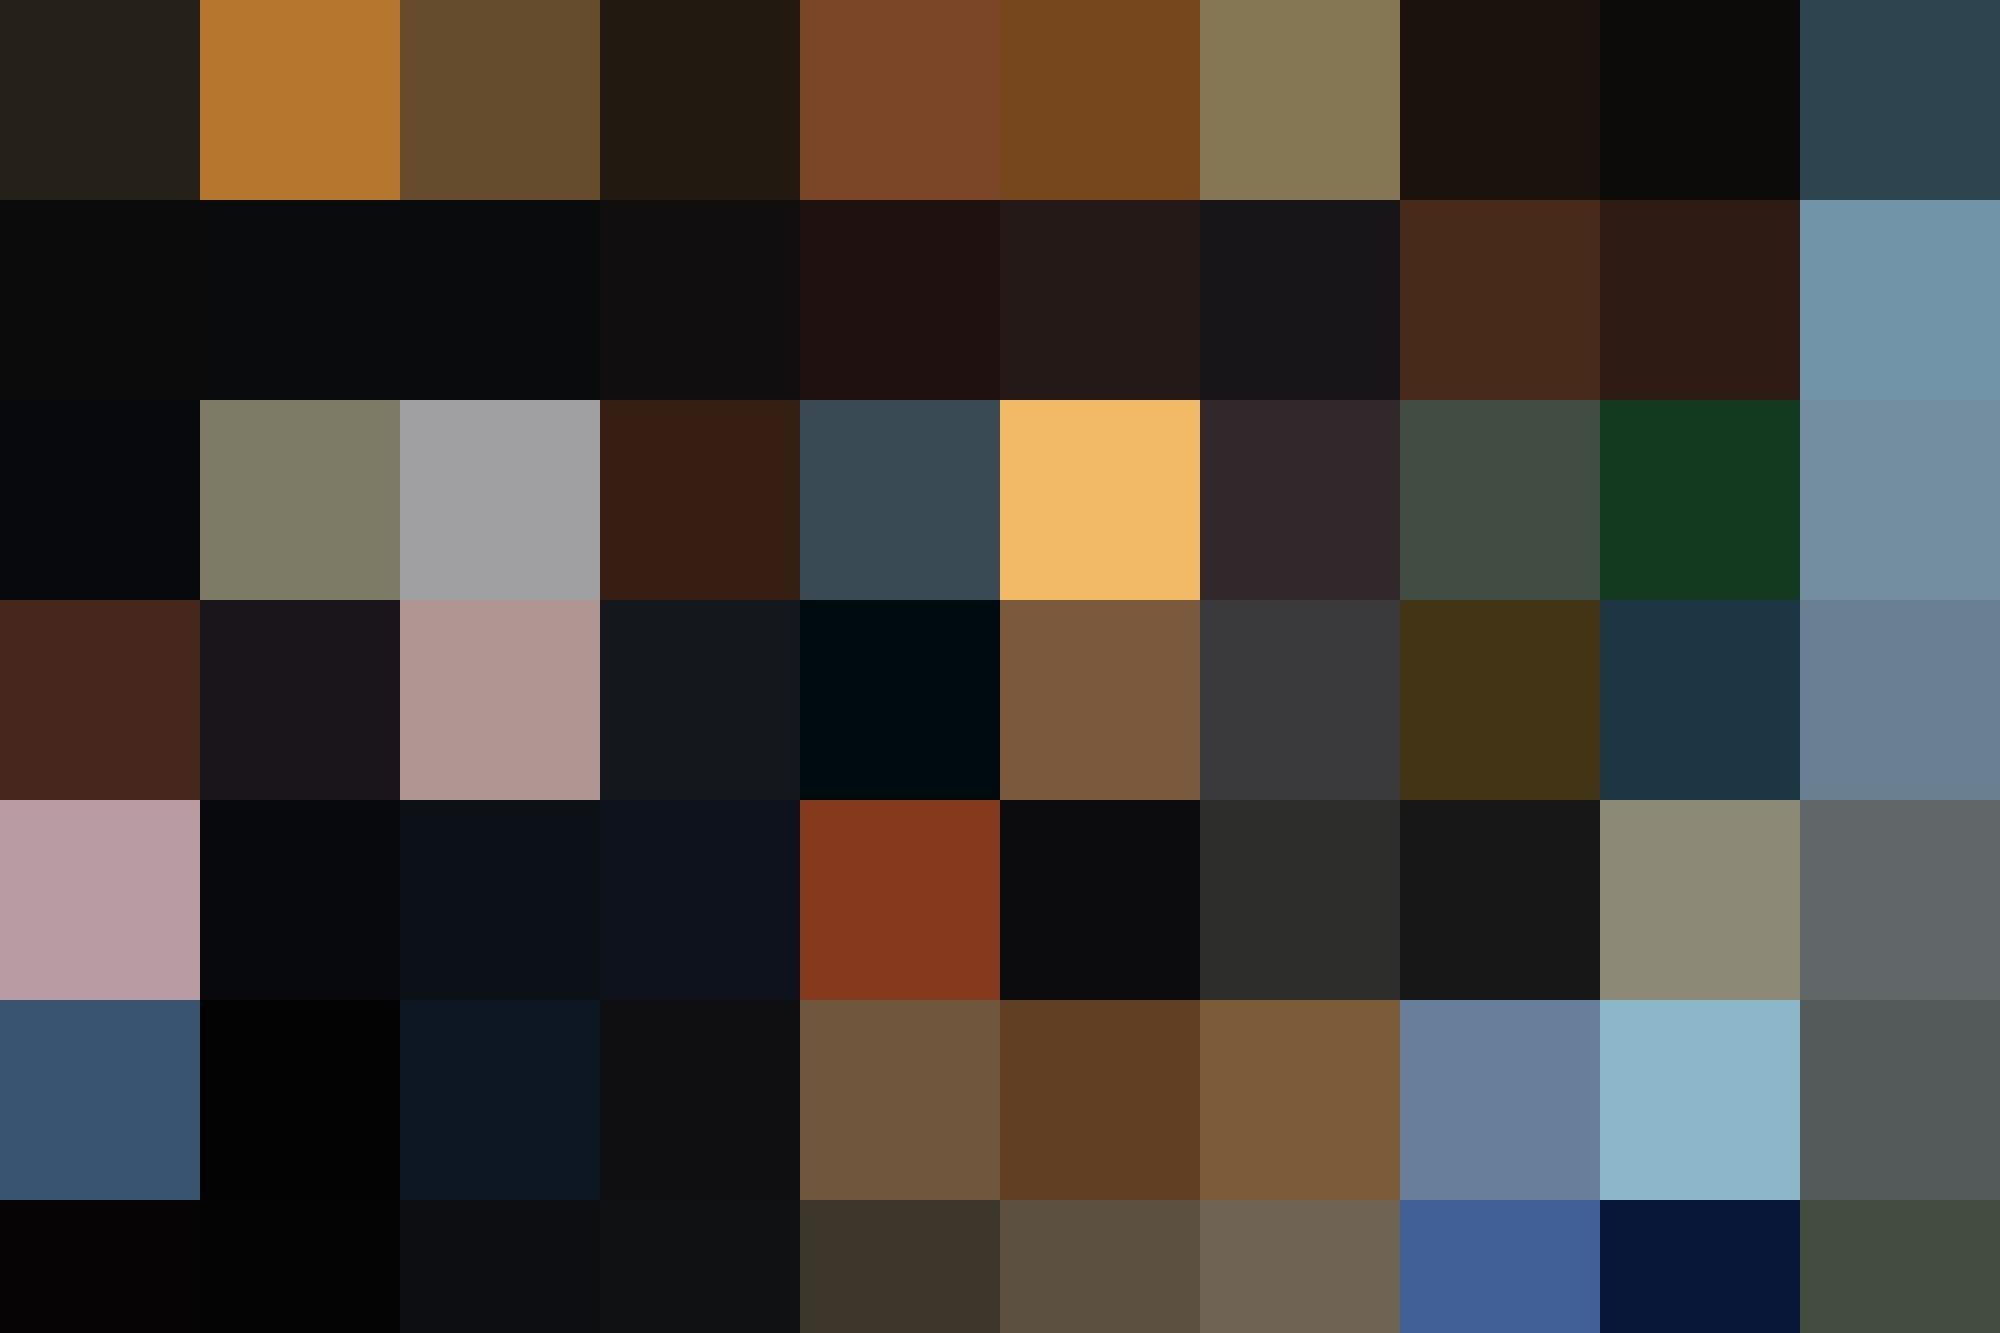 HAL Landscape 2500x1666 8